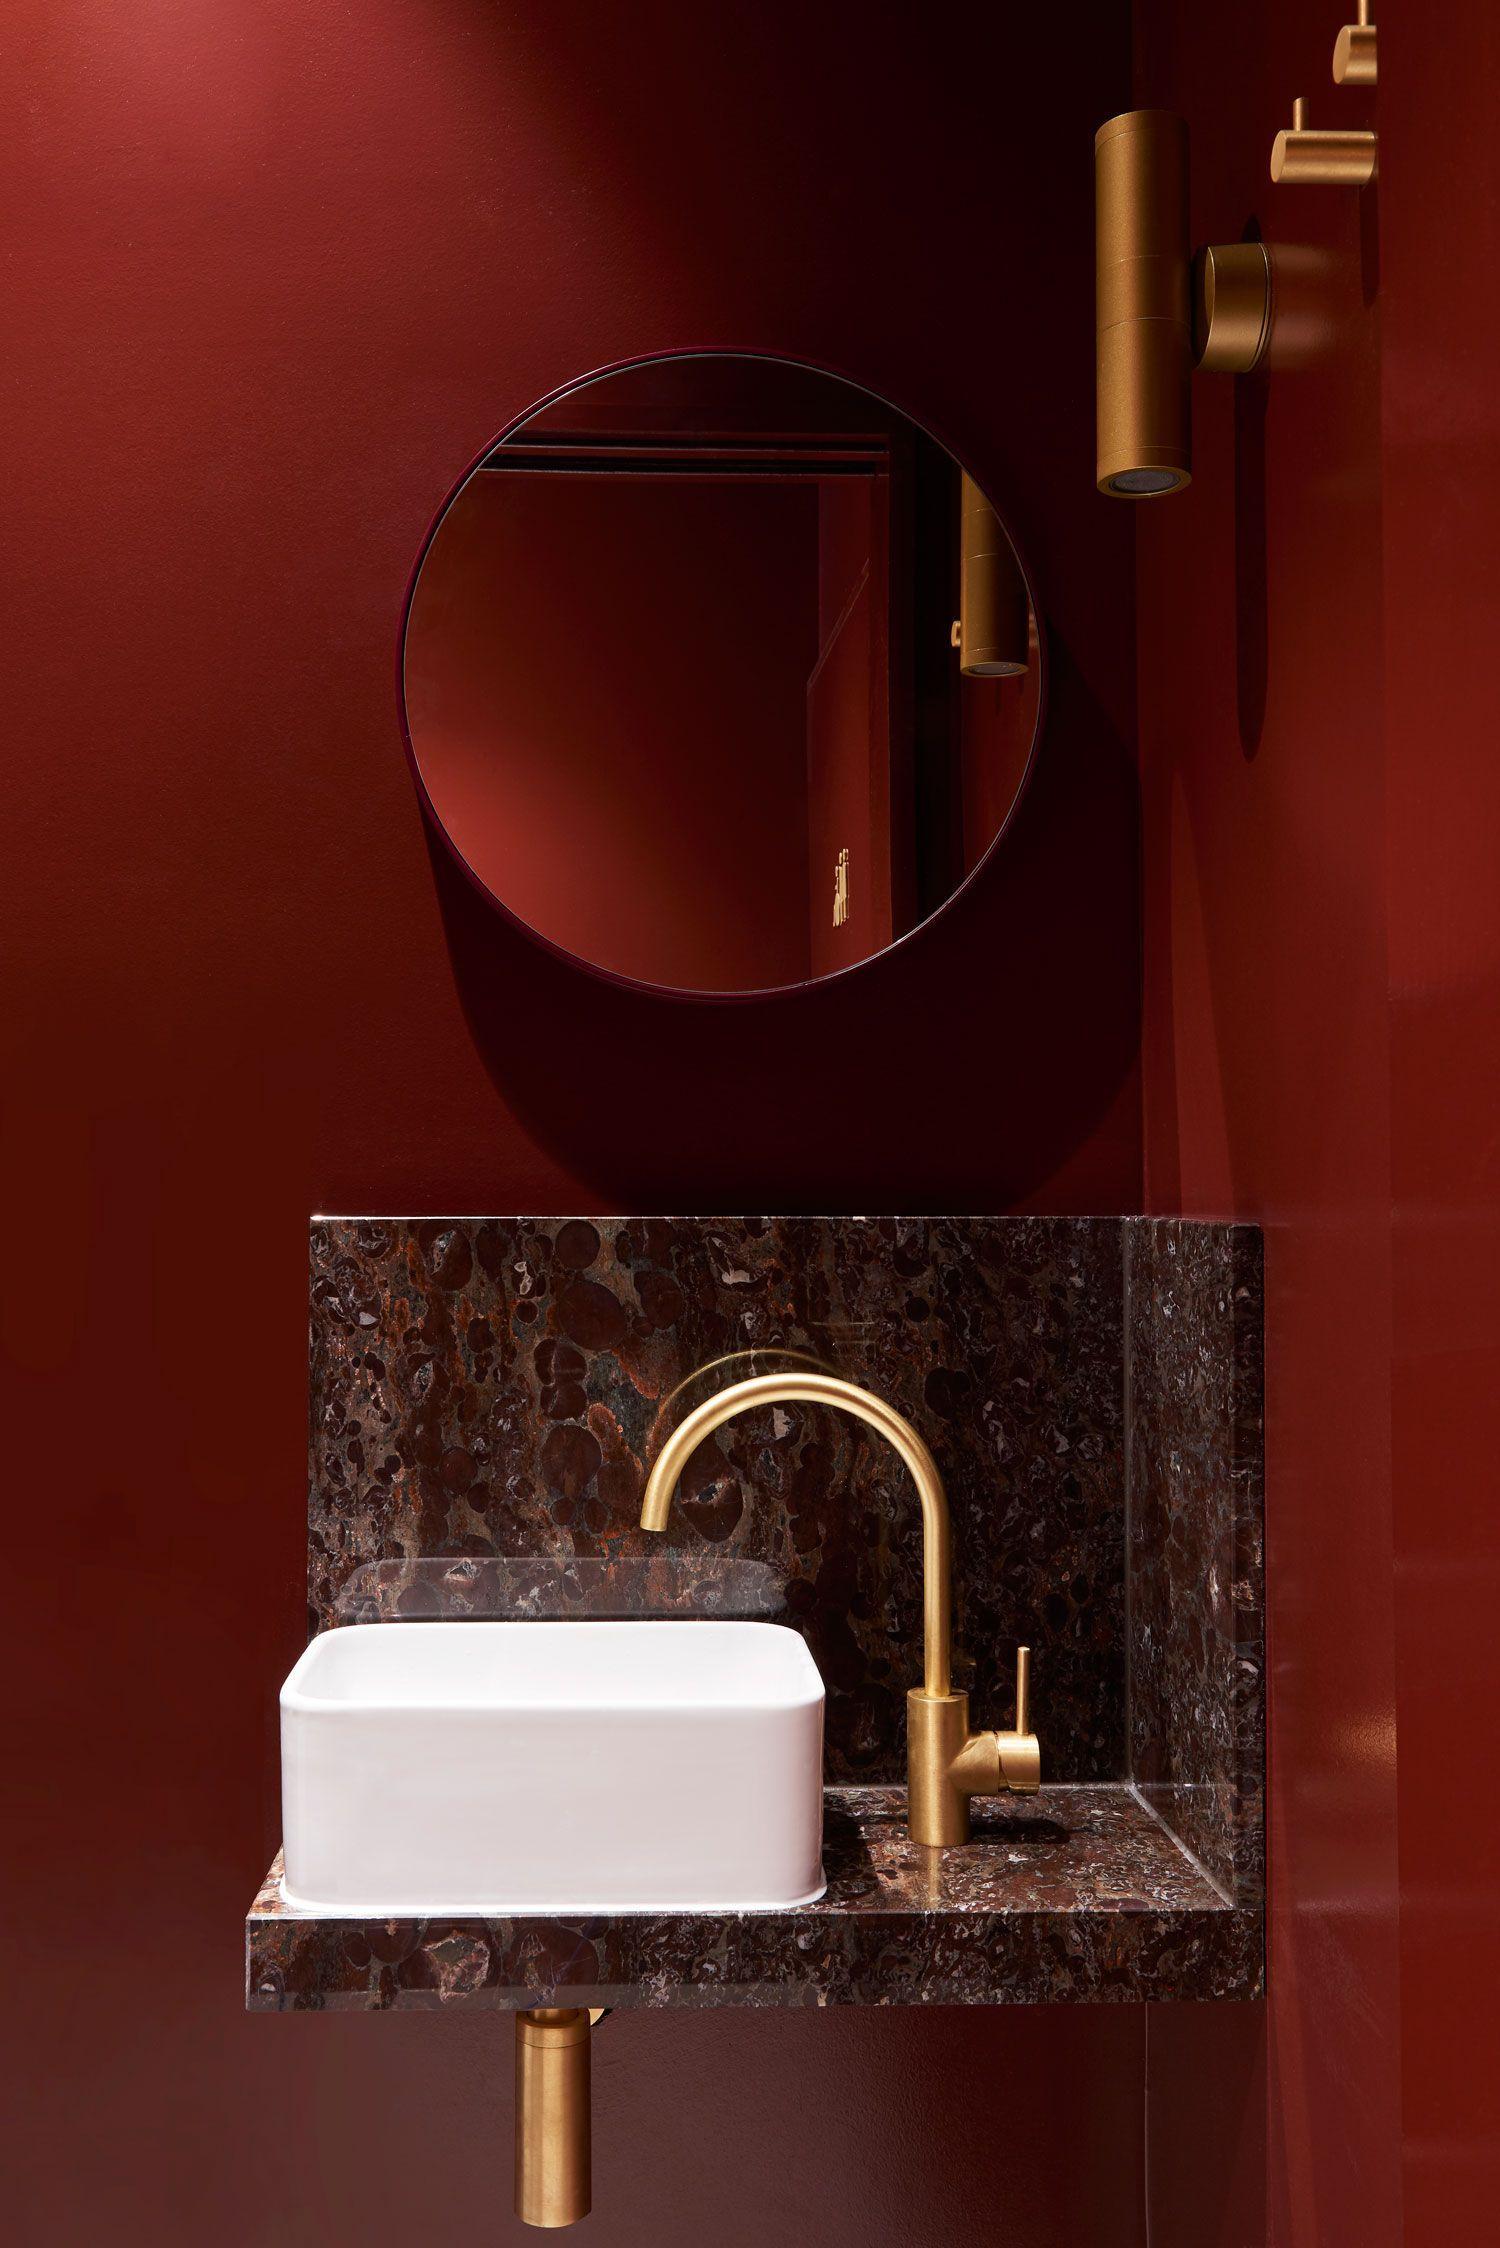 The Interior Of Workshop Brothers Glen Waverley By Studio Esteta Makes Nostalgic References To Asian Fo Bathroom Red Bathroom Interior Bathroom Interior Design